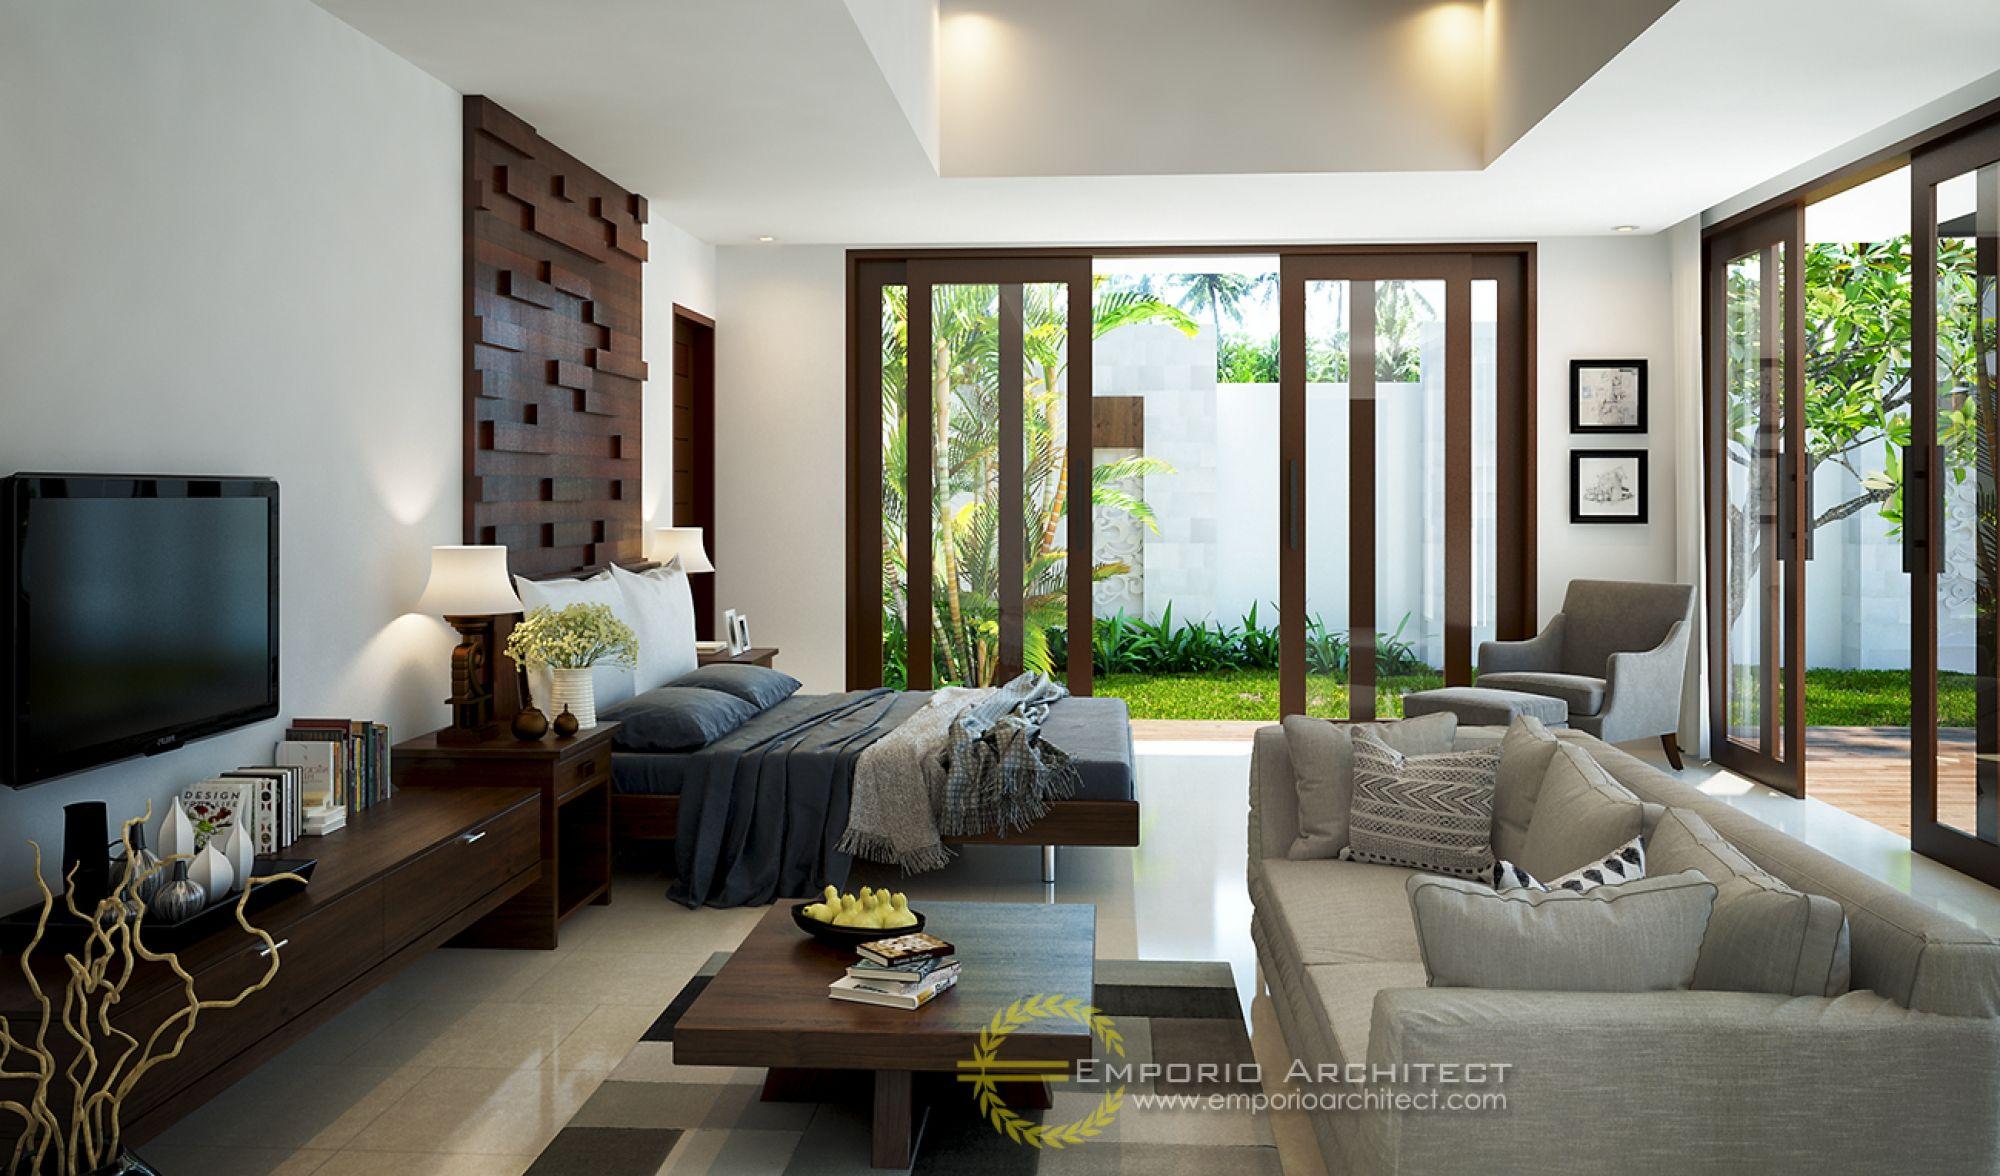 Jasa Desain Interior Villa - Bedroom#desaininterior #desaininteriorrumah #jasainterior #jasadesaininterior #interiorrumah #jasainteriorrumah #interiorrumahminimalis #interiorrumahmodern